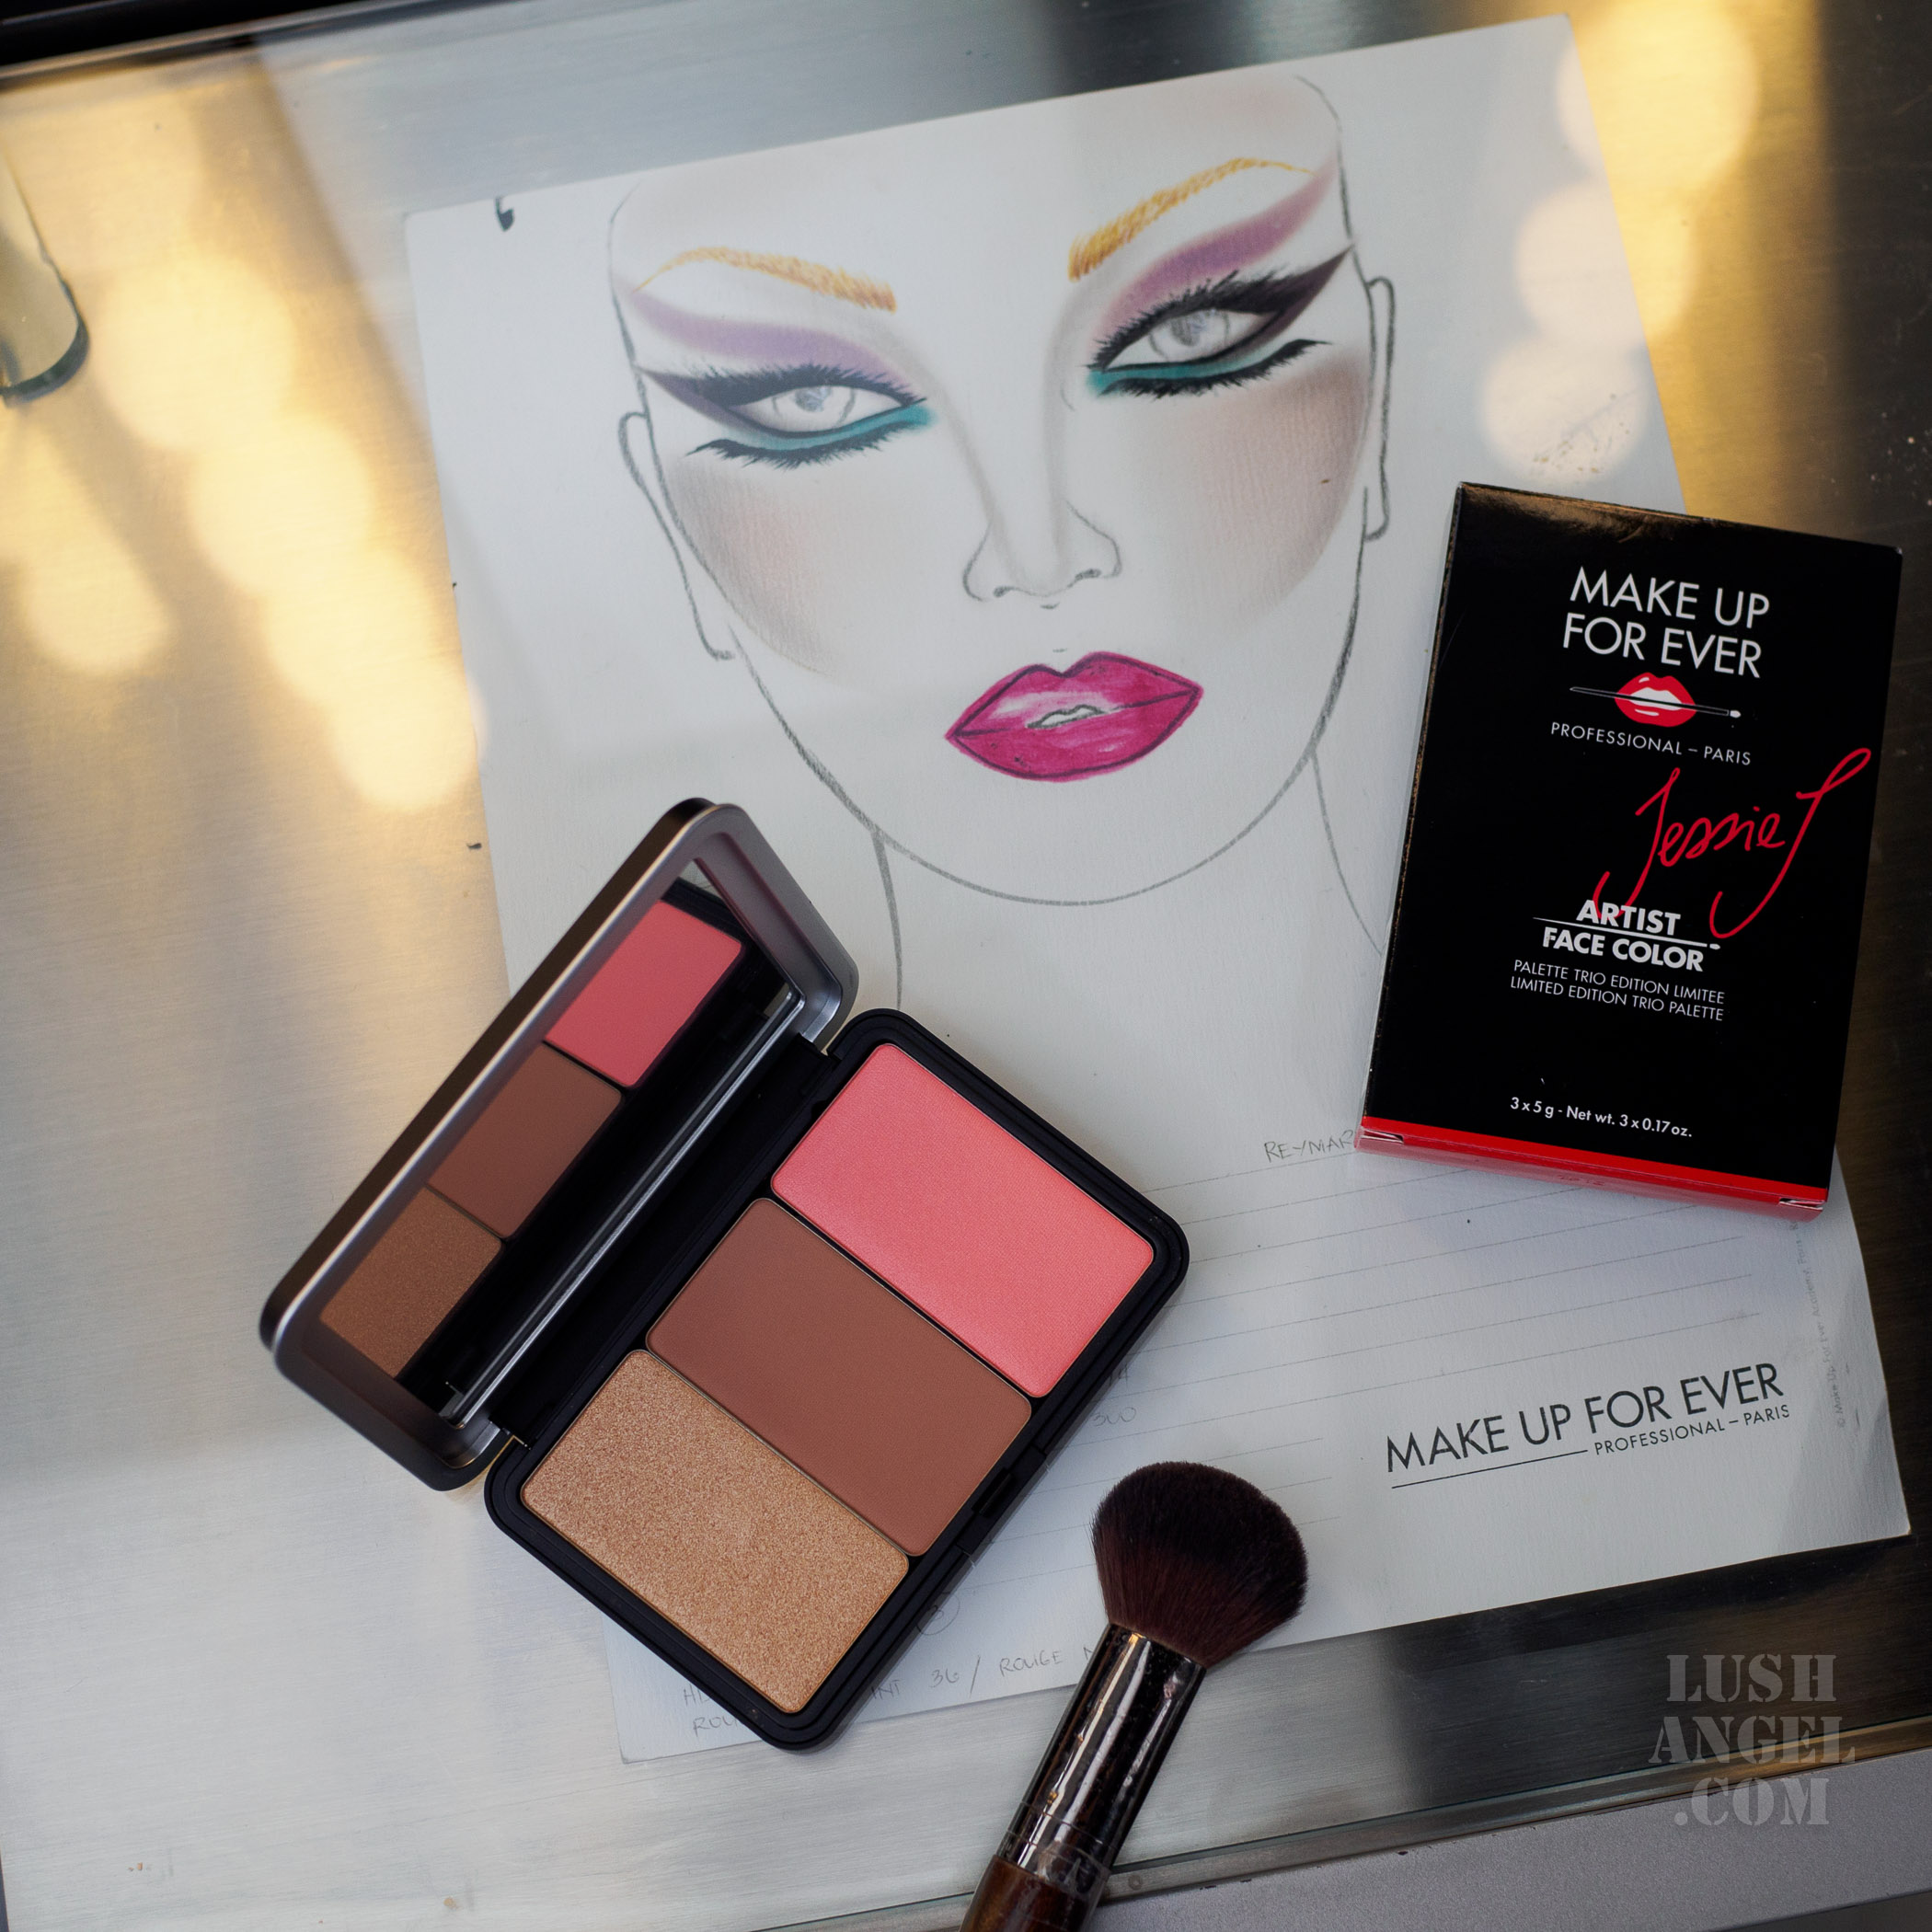 make-up-for-ever-jessie-j